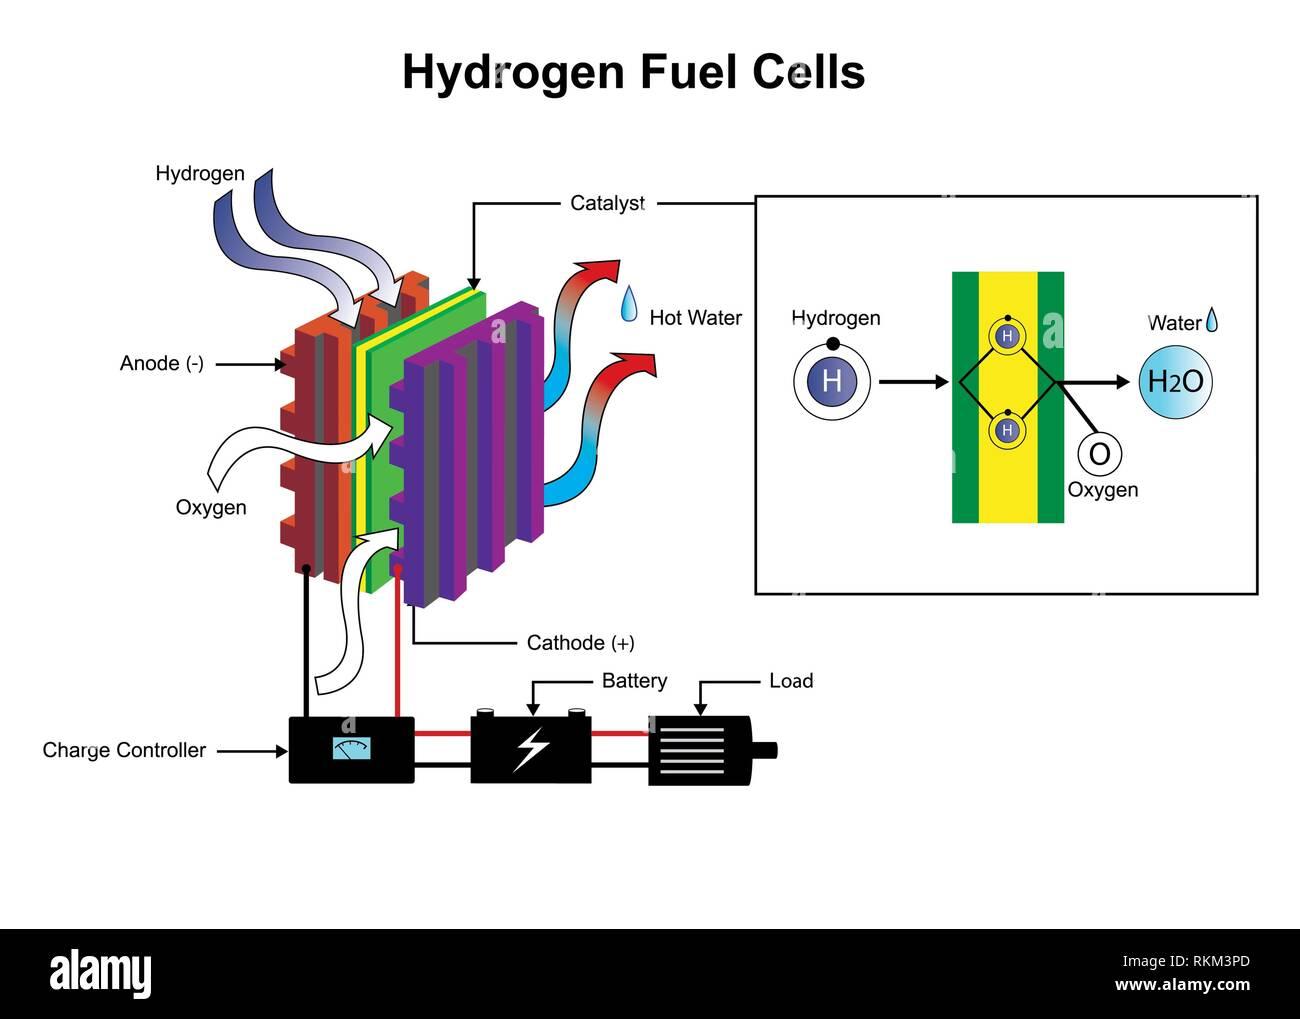 hight resolution of hydrogen fuel cells diagram